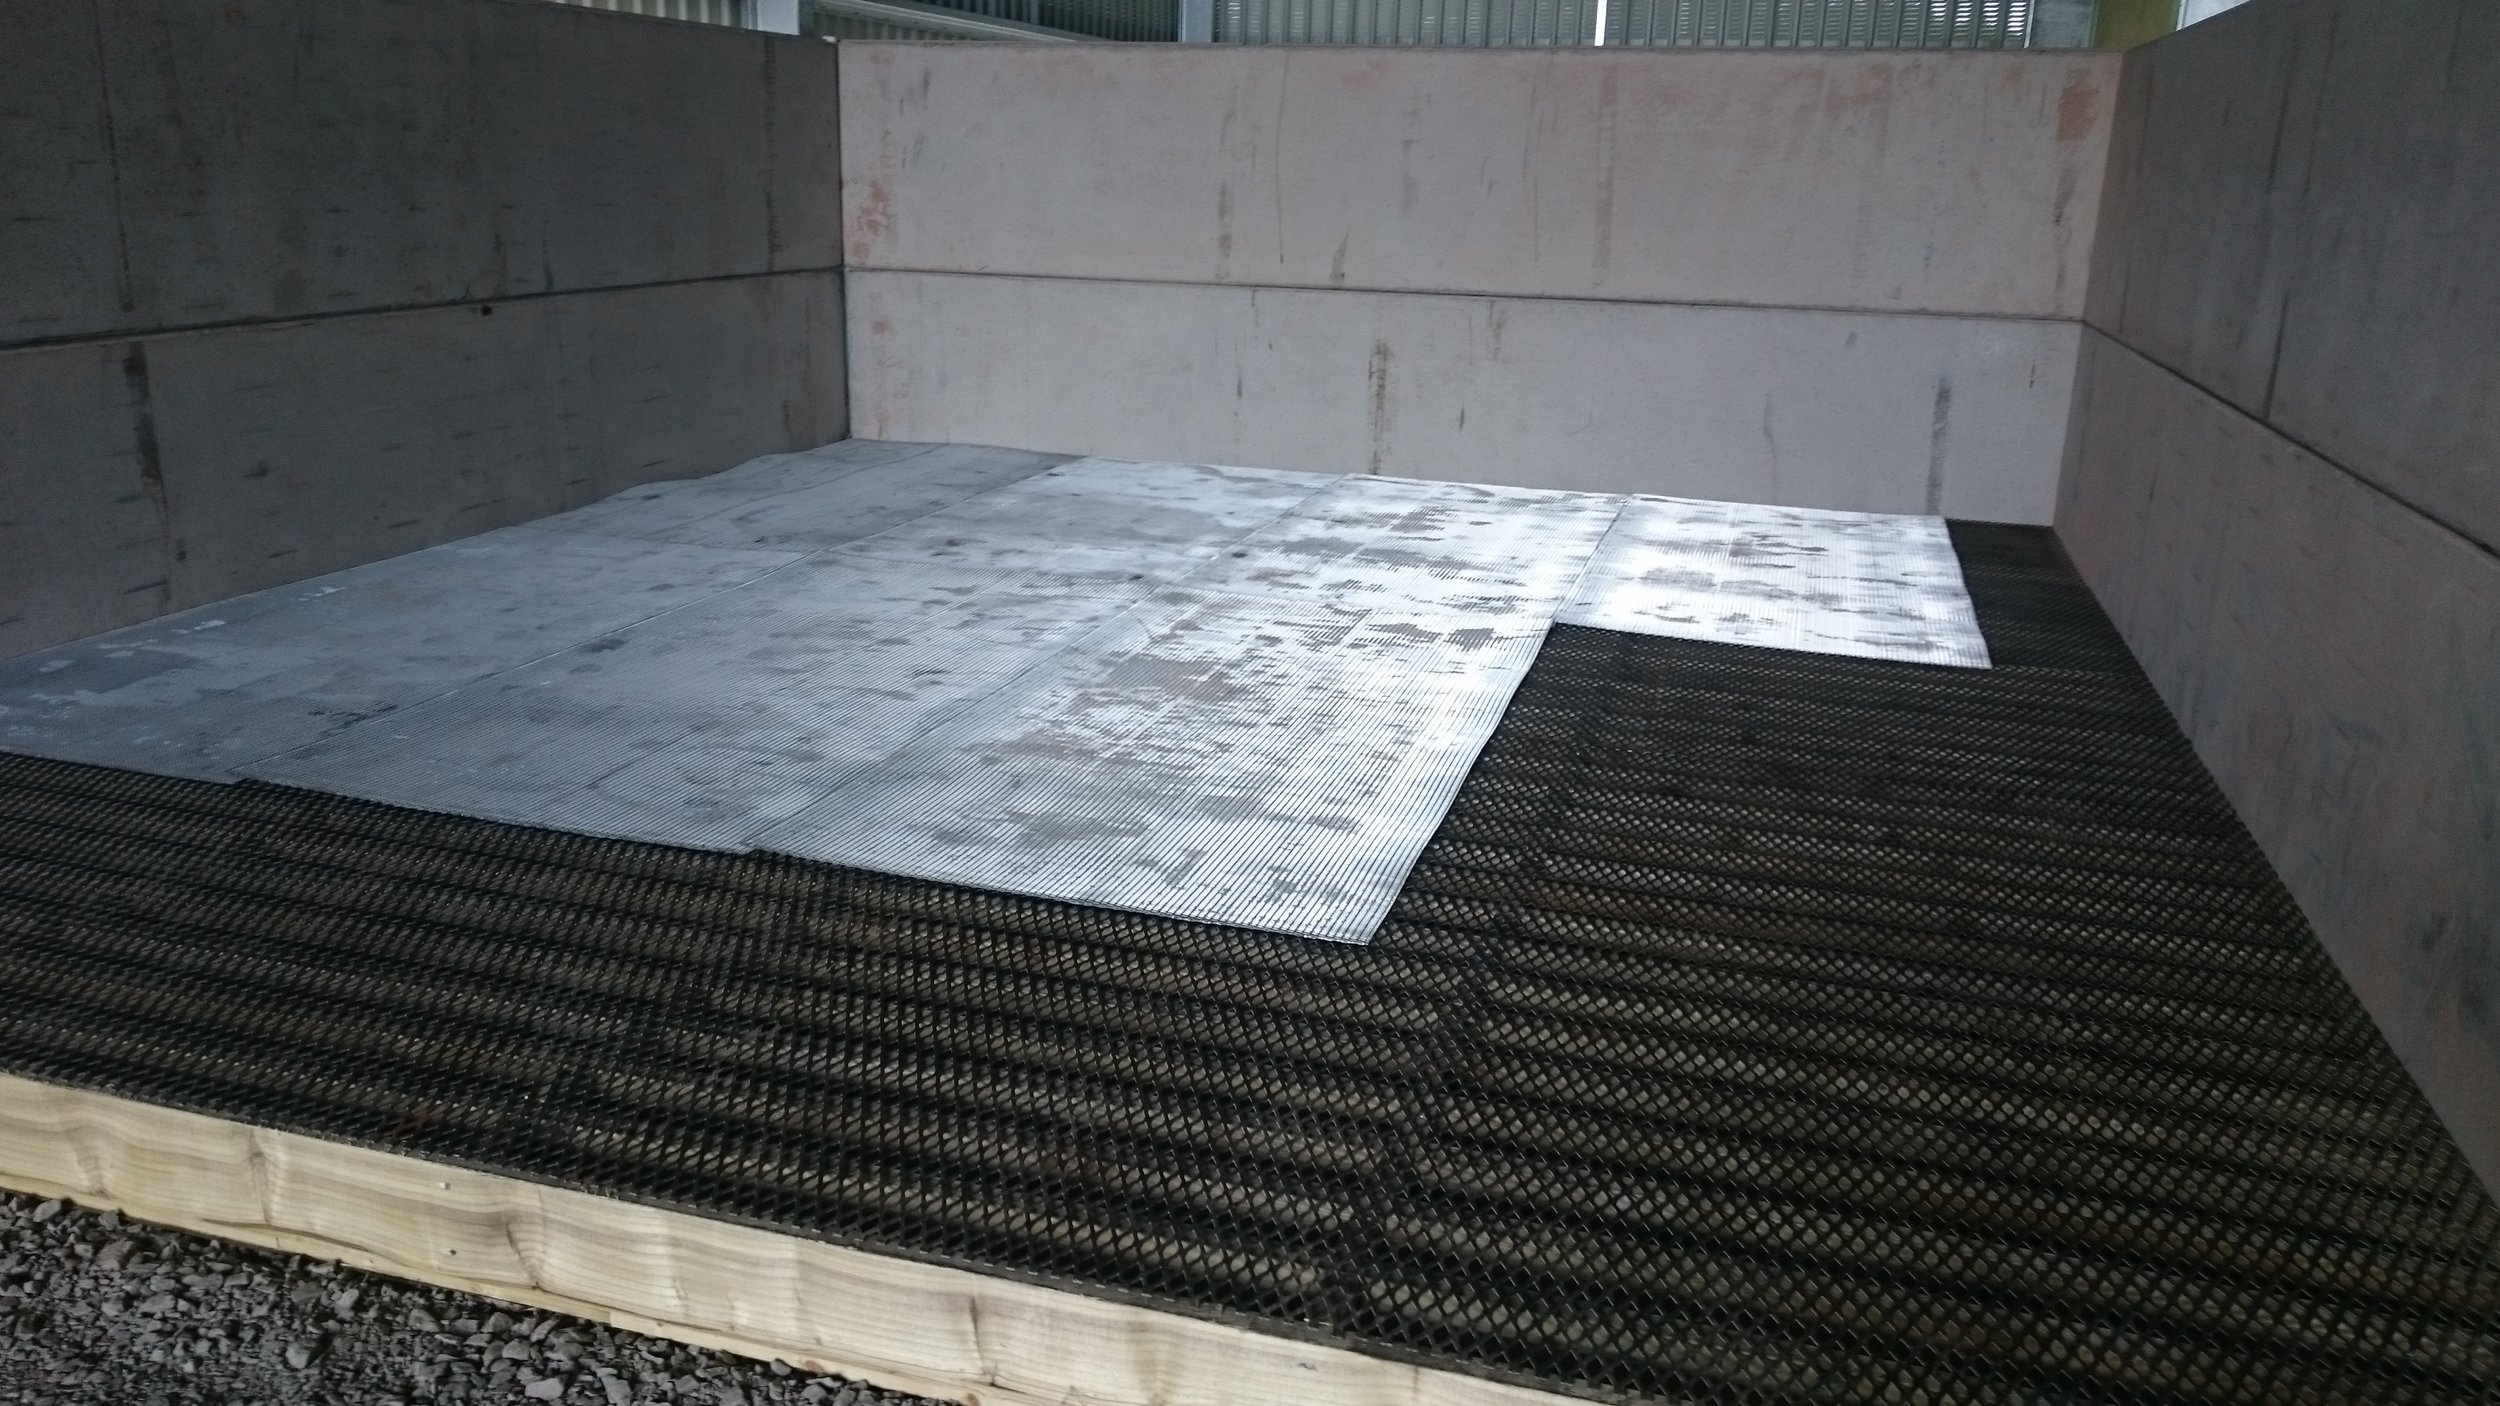 Drying floor installation